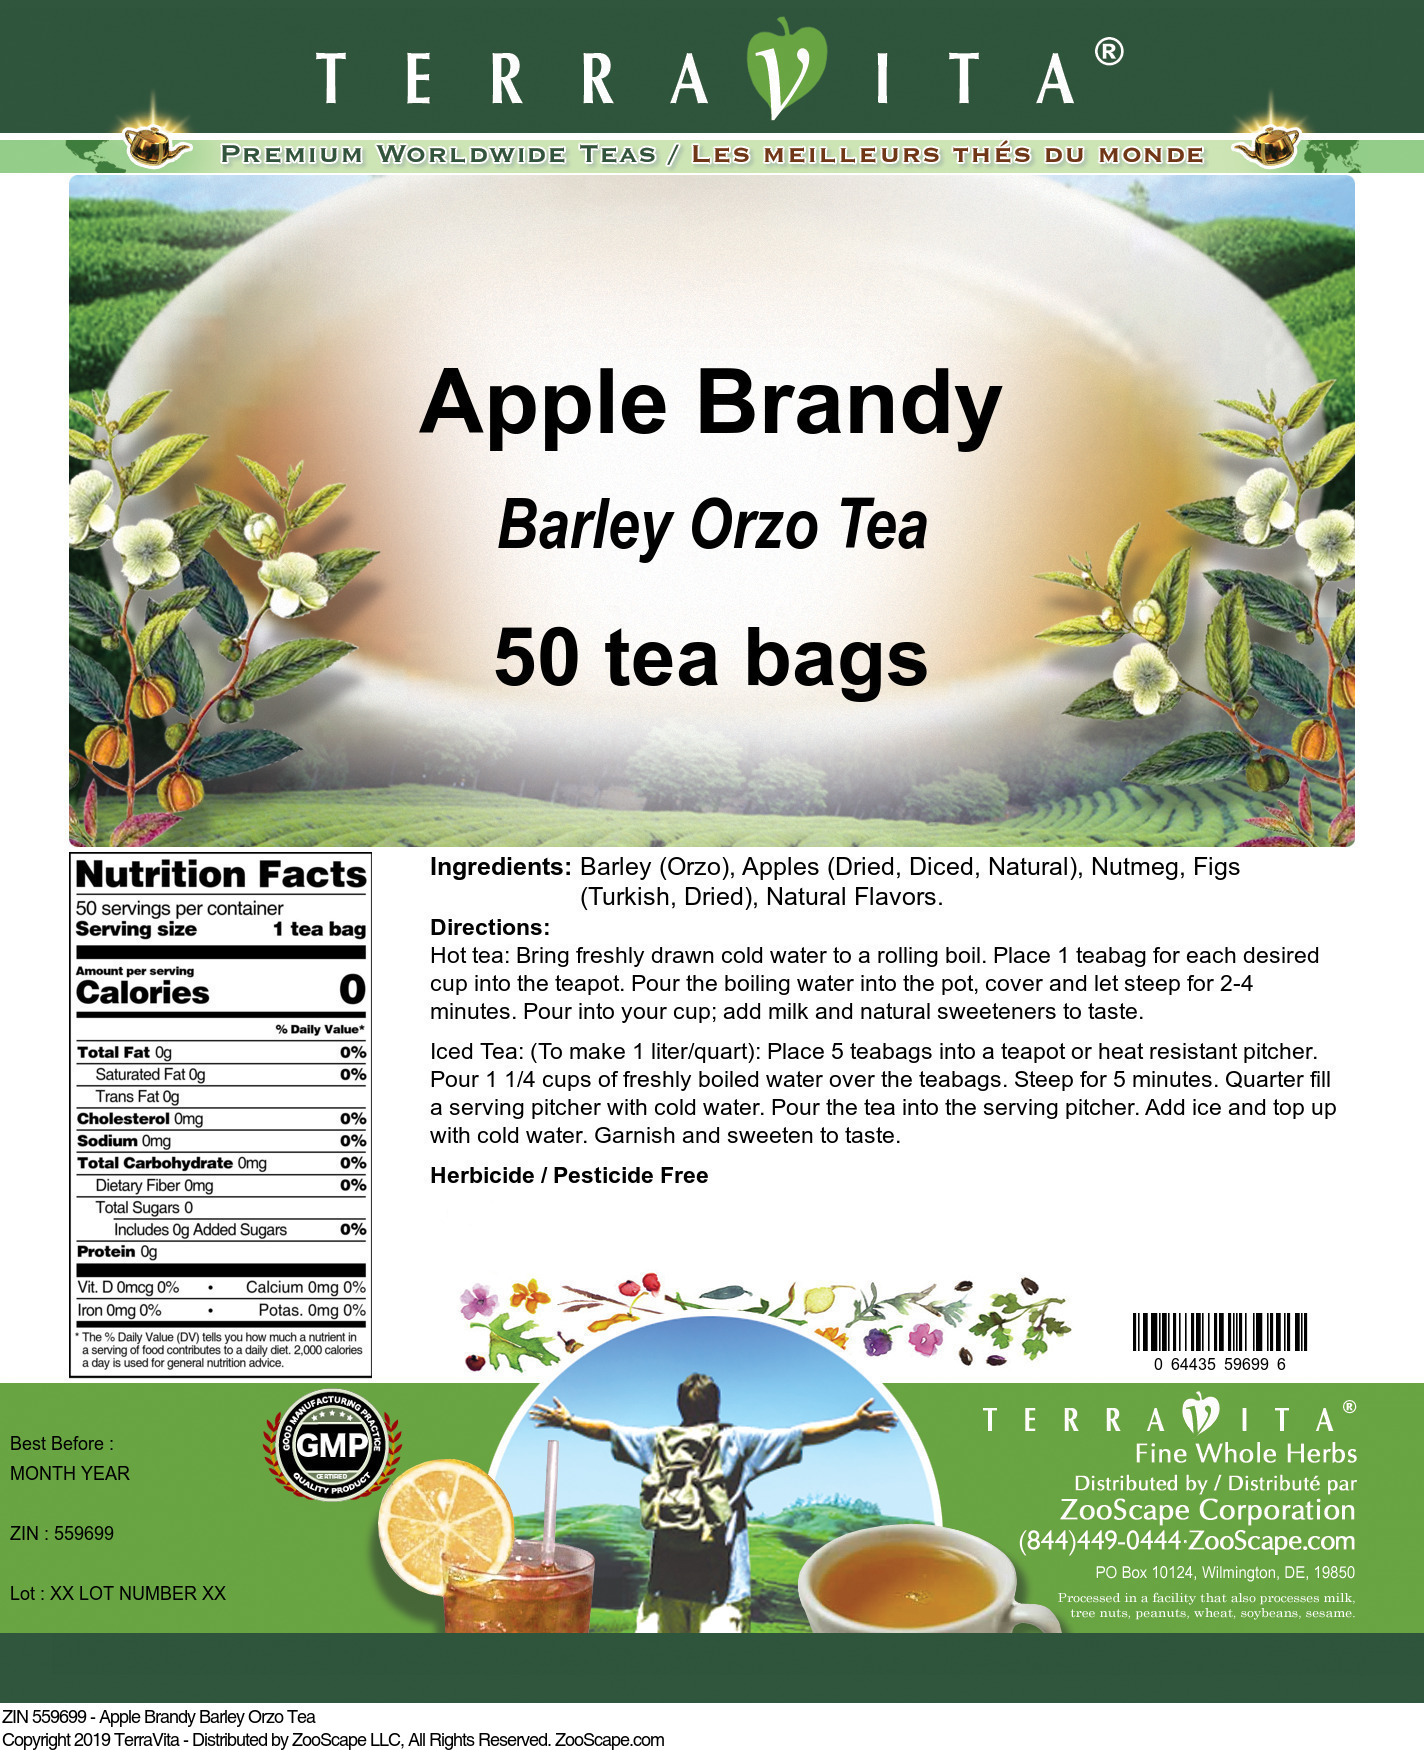 Apple Brandy Barley Orzo Tea